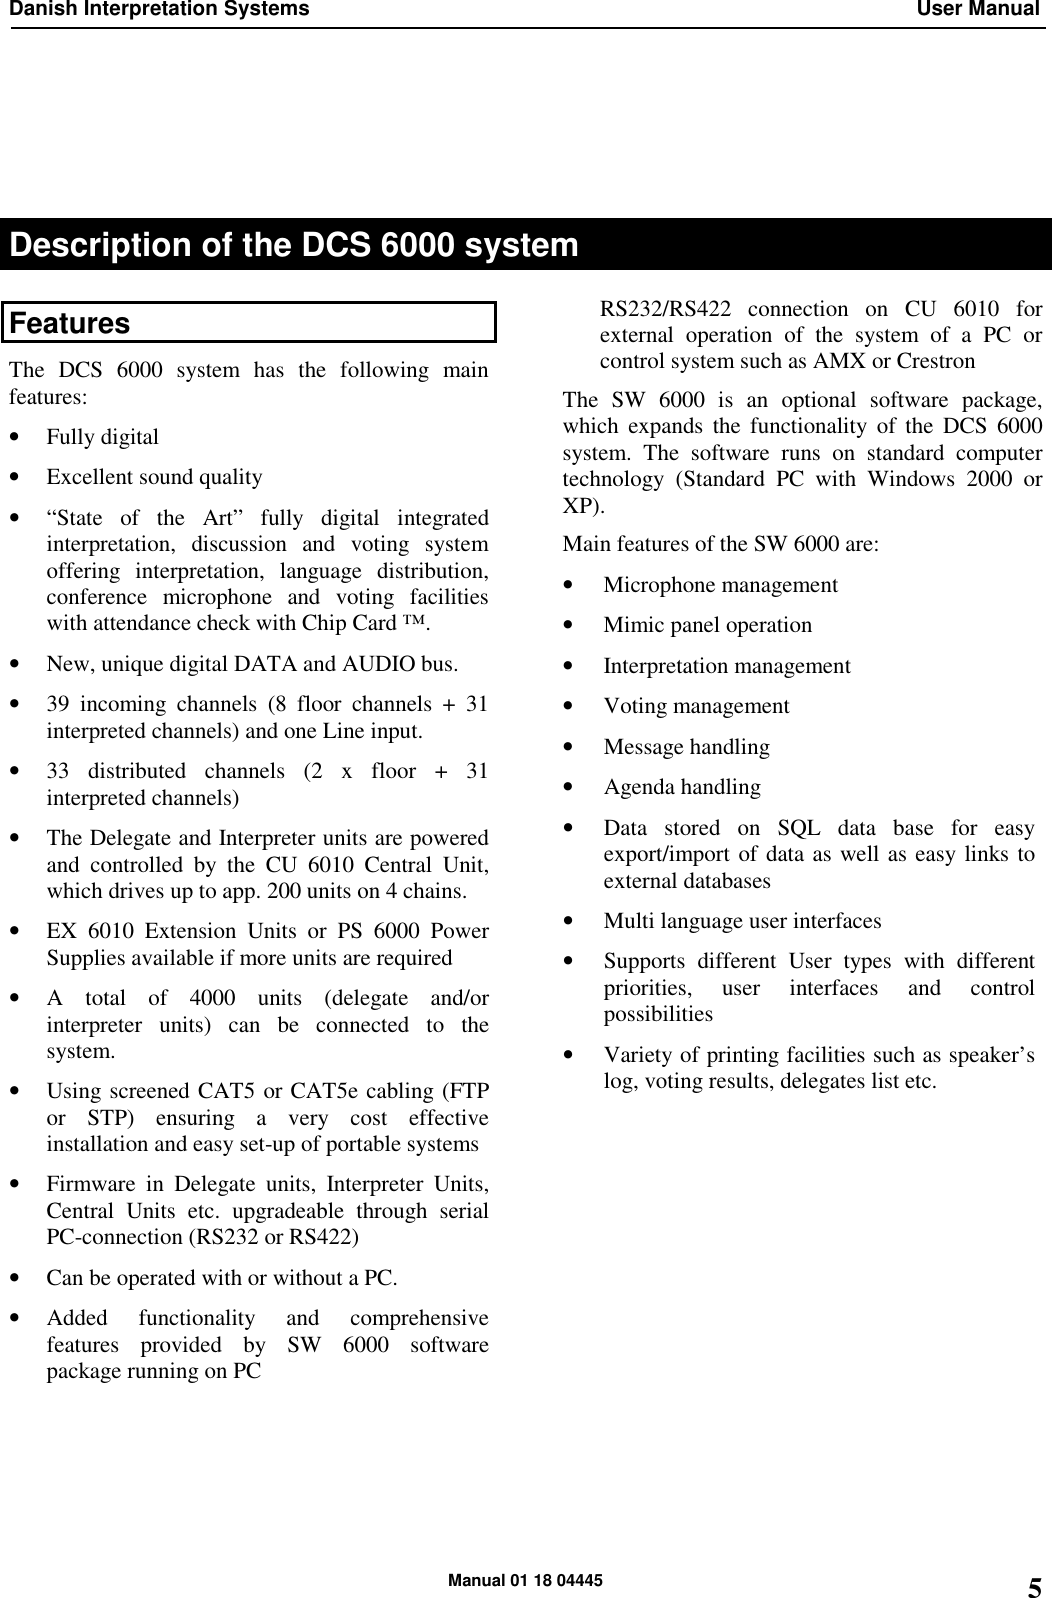 Listen Technologies Interpreter Set Is 6132P Users Manual IS6132 Rev M